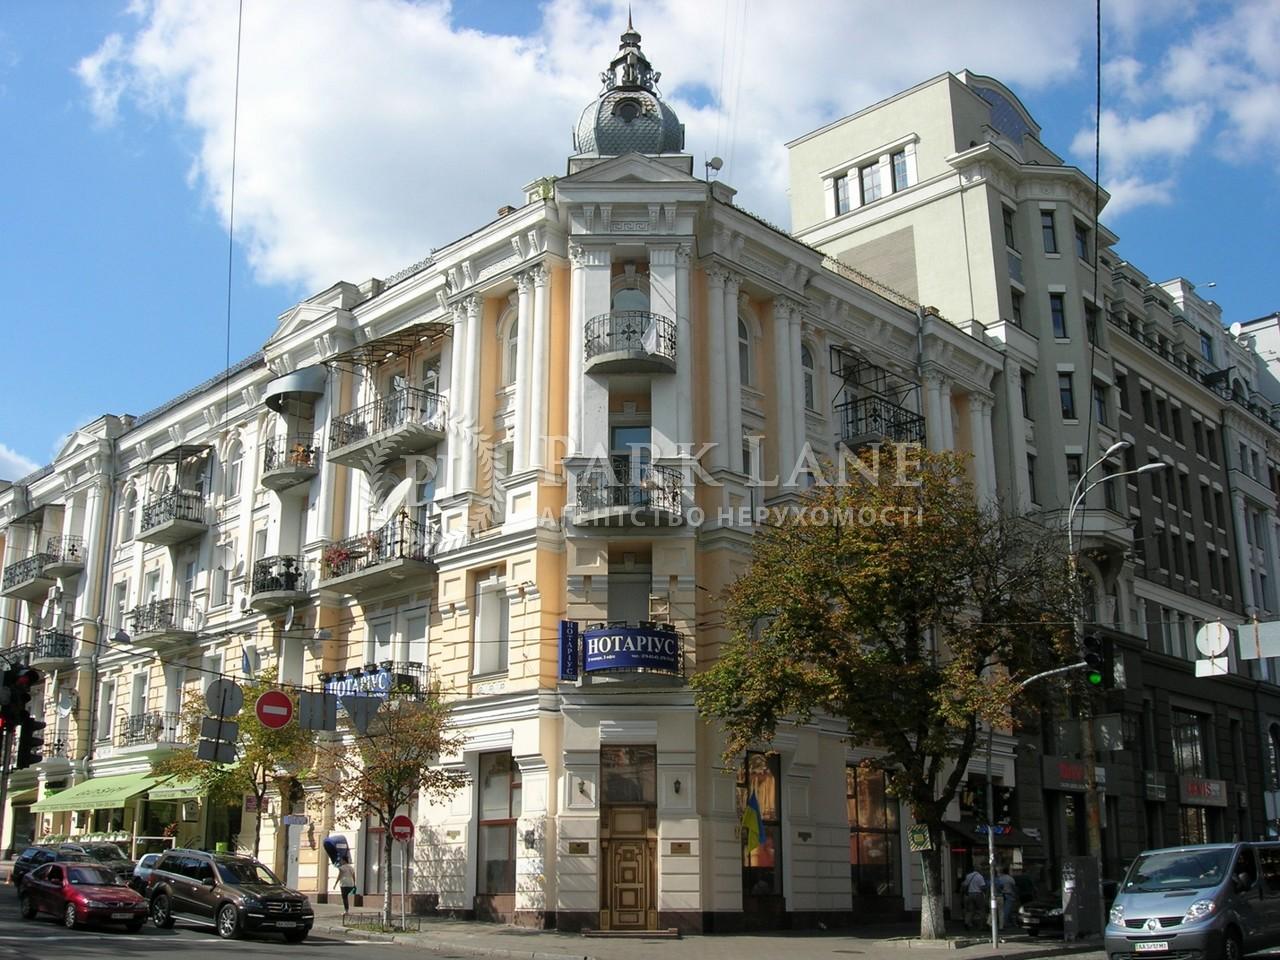 Квартира ул. Владимирская, 40/2, Киев, R-23331 - Фото 1